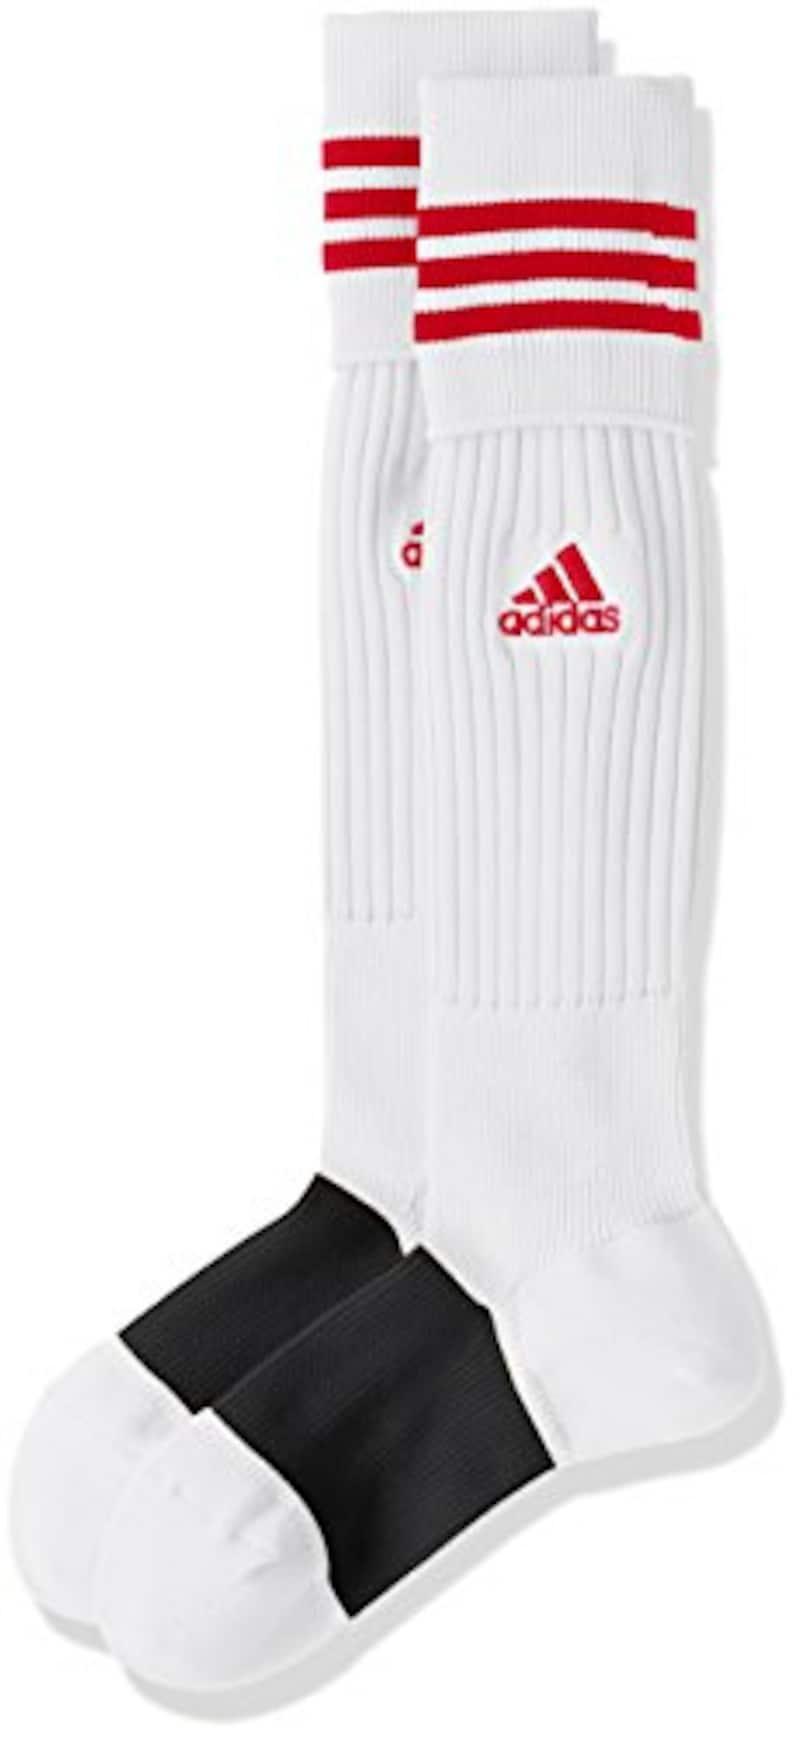 adidas(アディダス),3ストライプ ゲームソックス ユニセックス,MKJ69